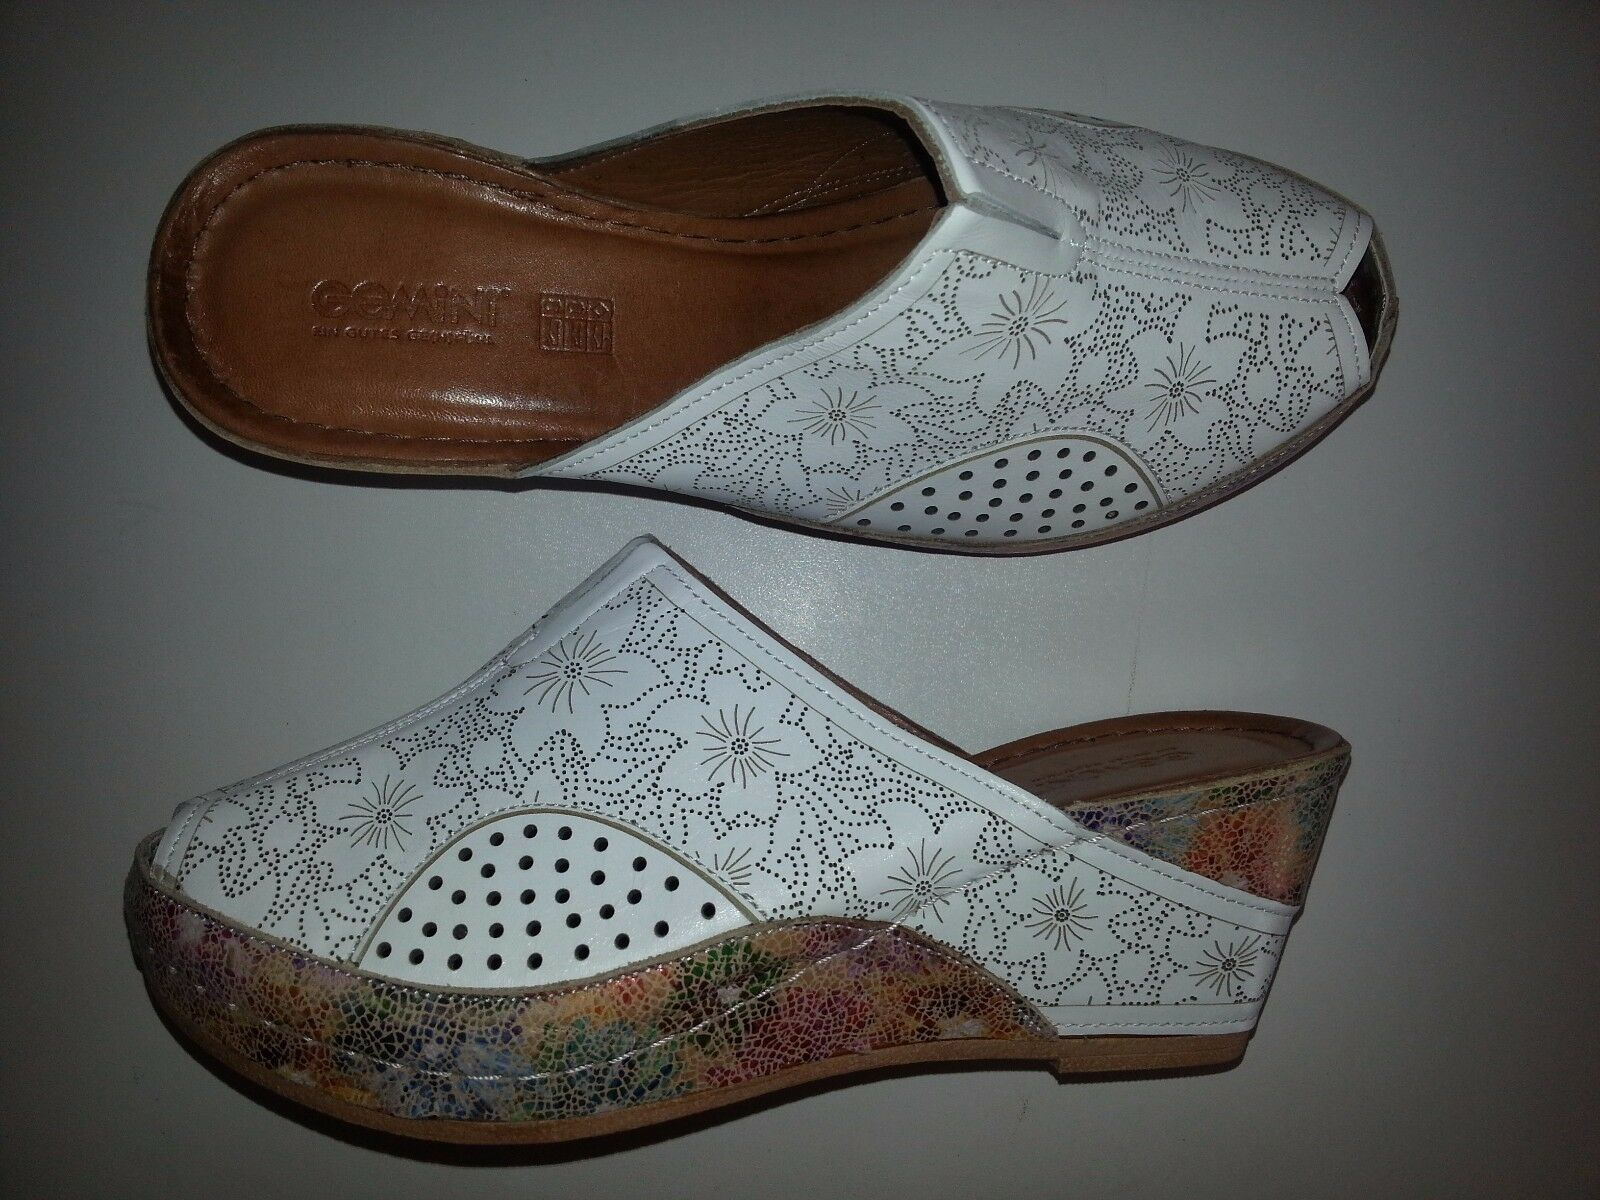 Gemini Damen Leder Clogs Pantolette mehrfarbig Größe 38-40-41-42 NEU